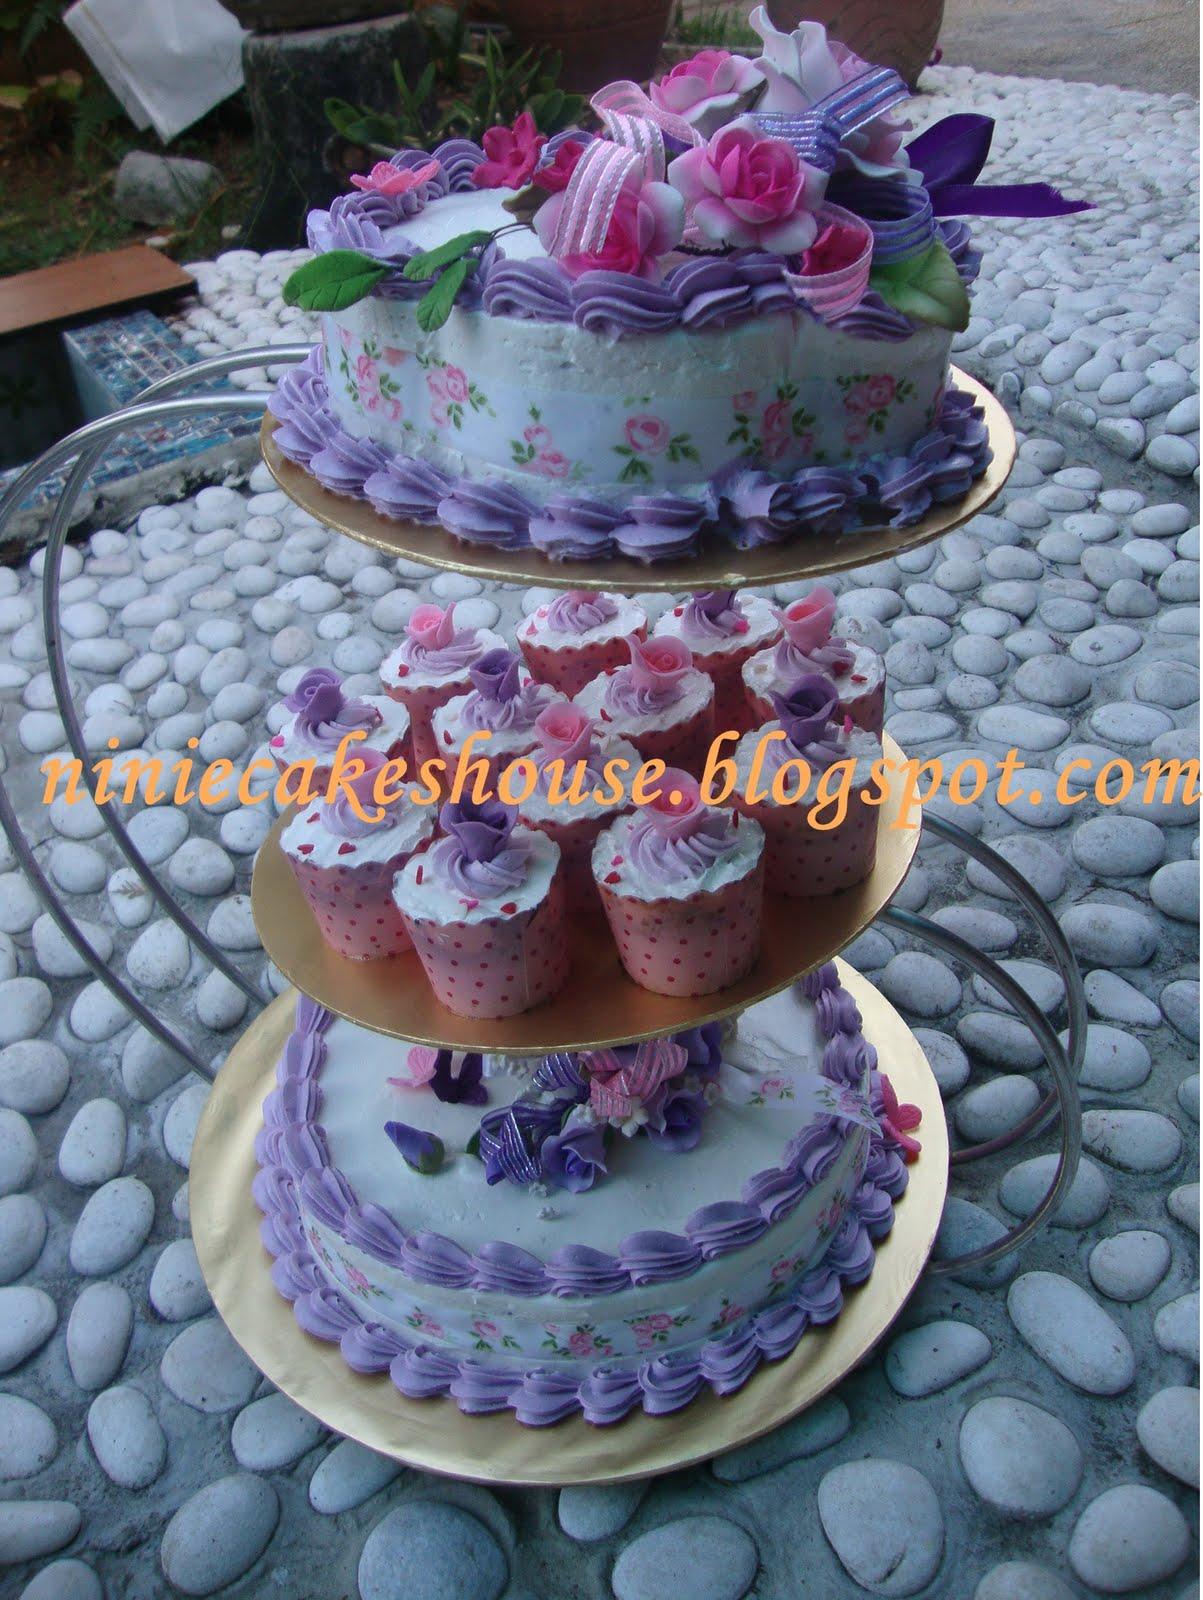 ninie cakes house 3 Tier Wedding Cakes purple and pink